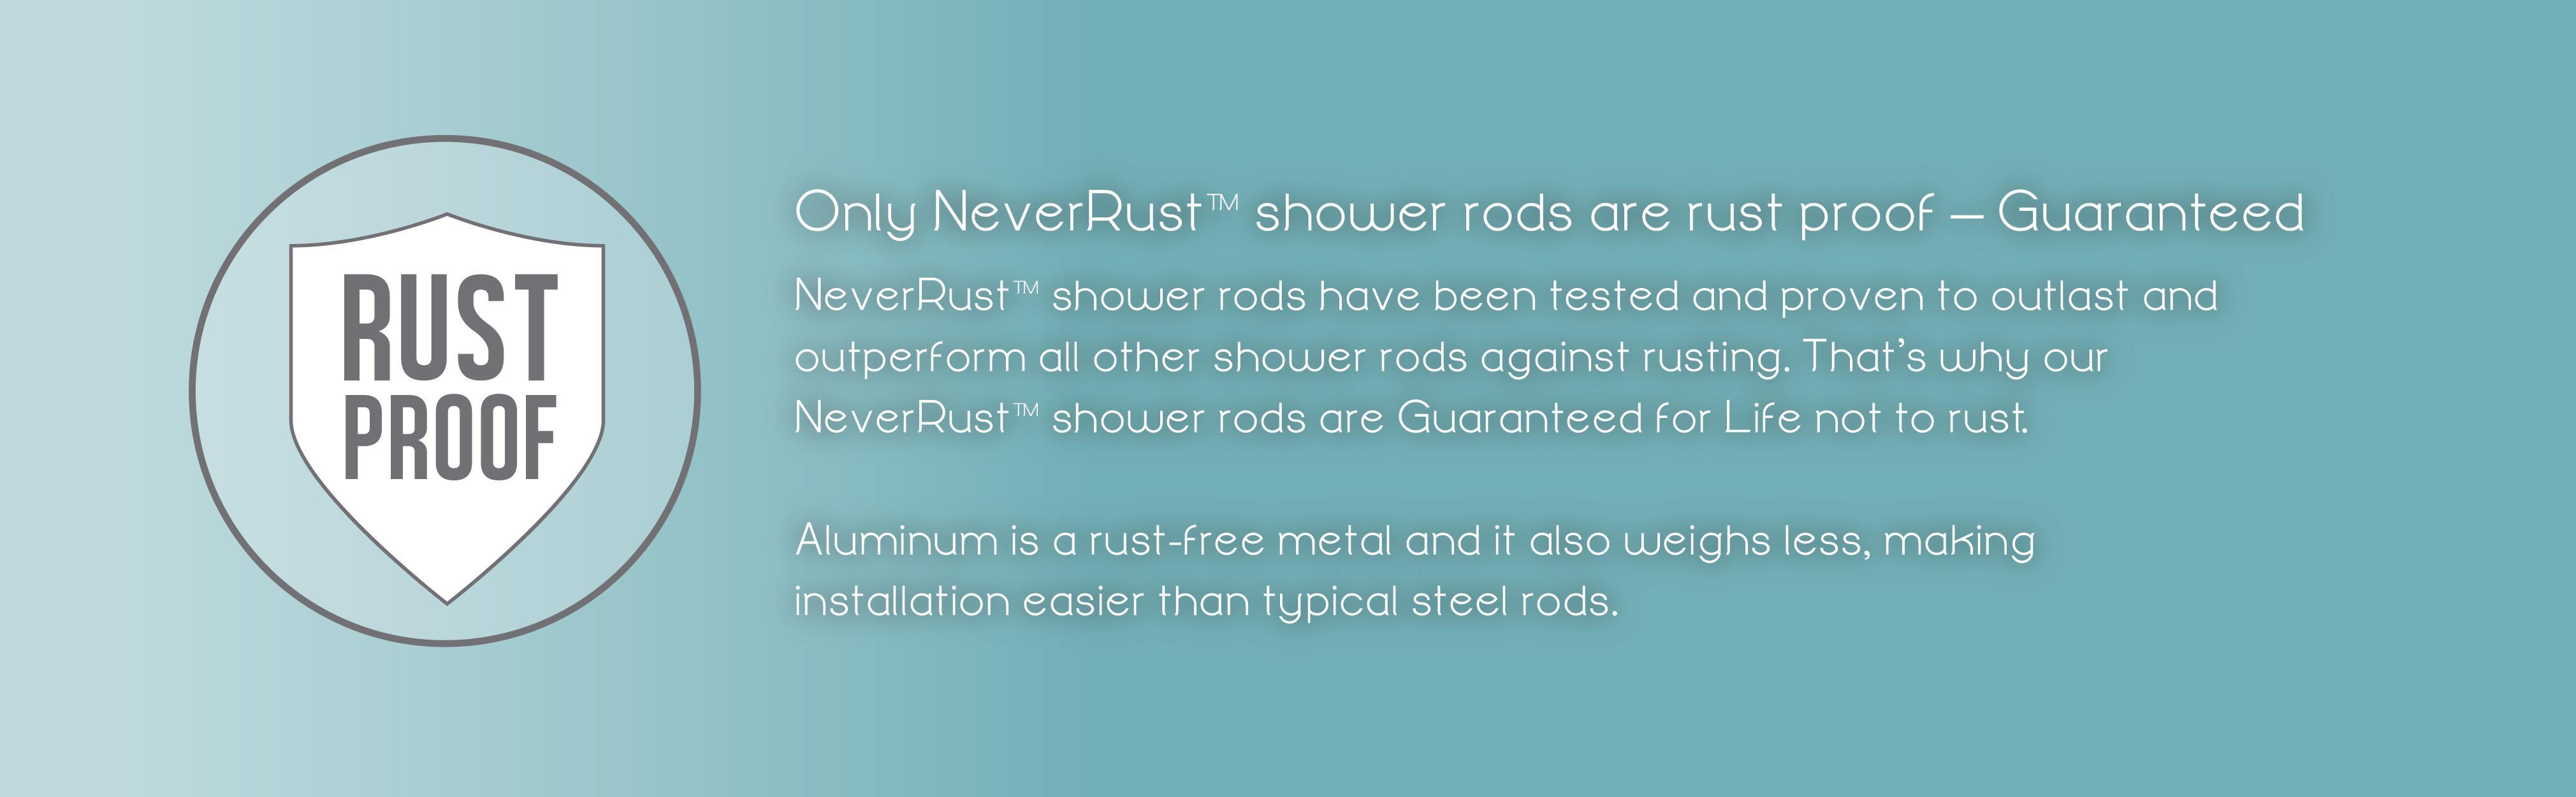 zenith shower rod installation instructions